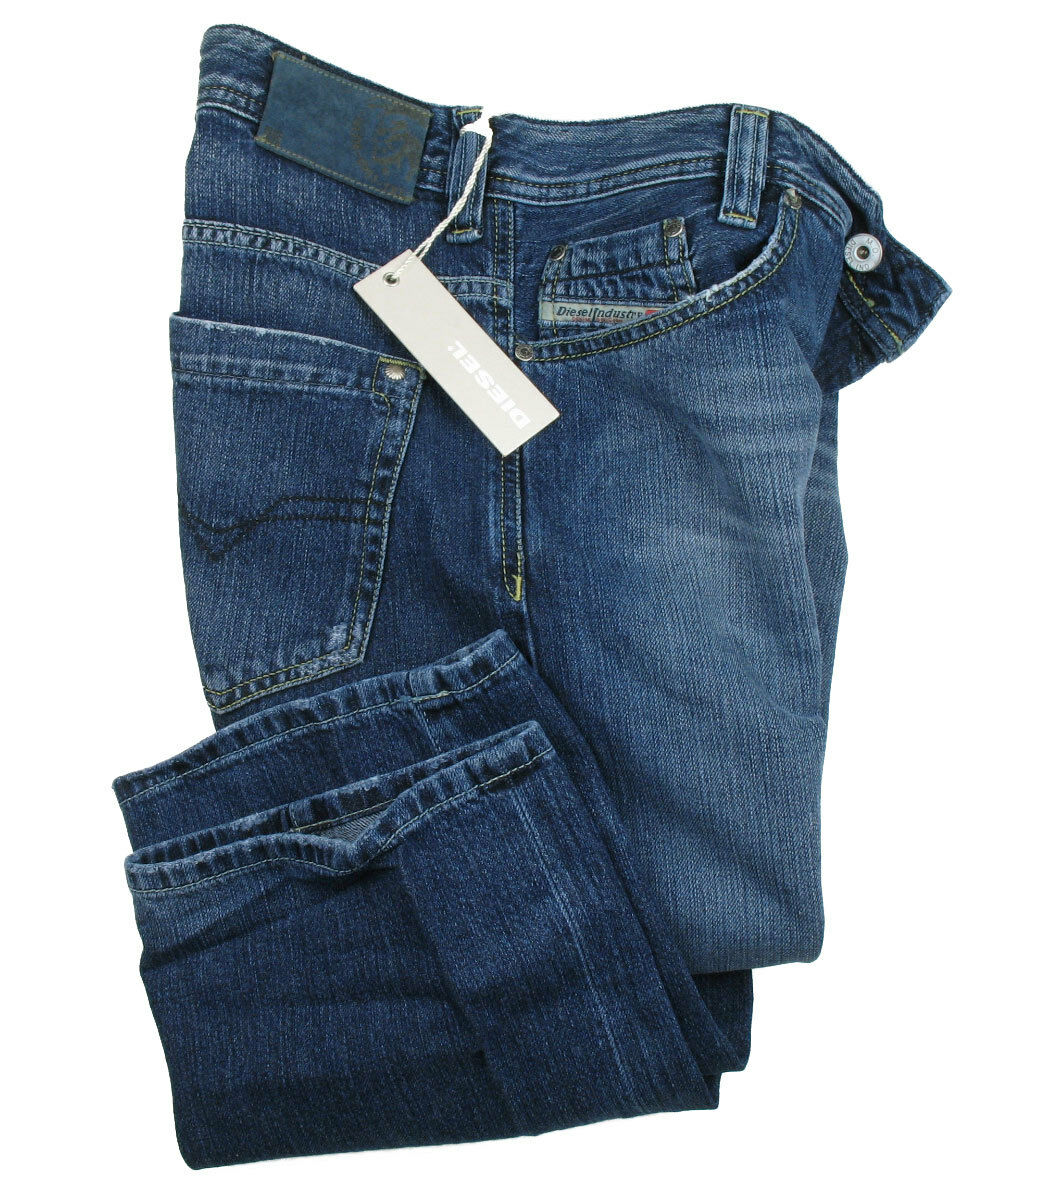 Diesel Jeans KAJO W29 L34 (Straight Fit) Dark bluee Brushed %%